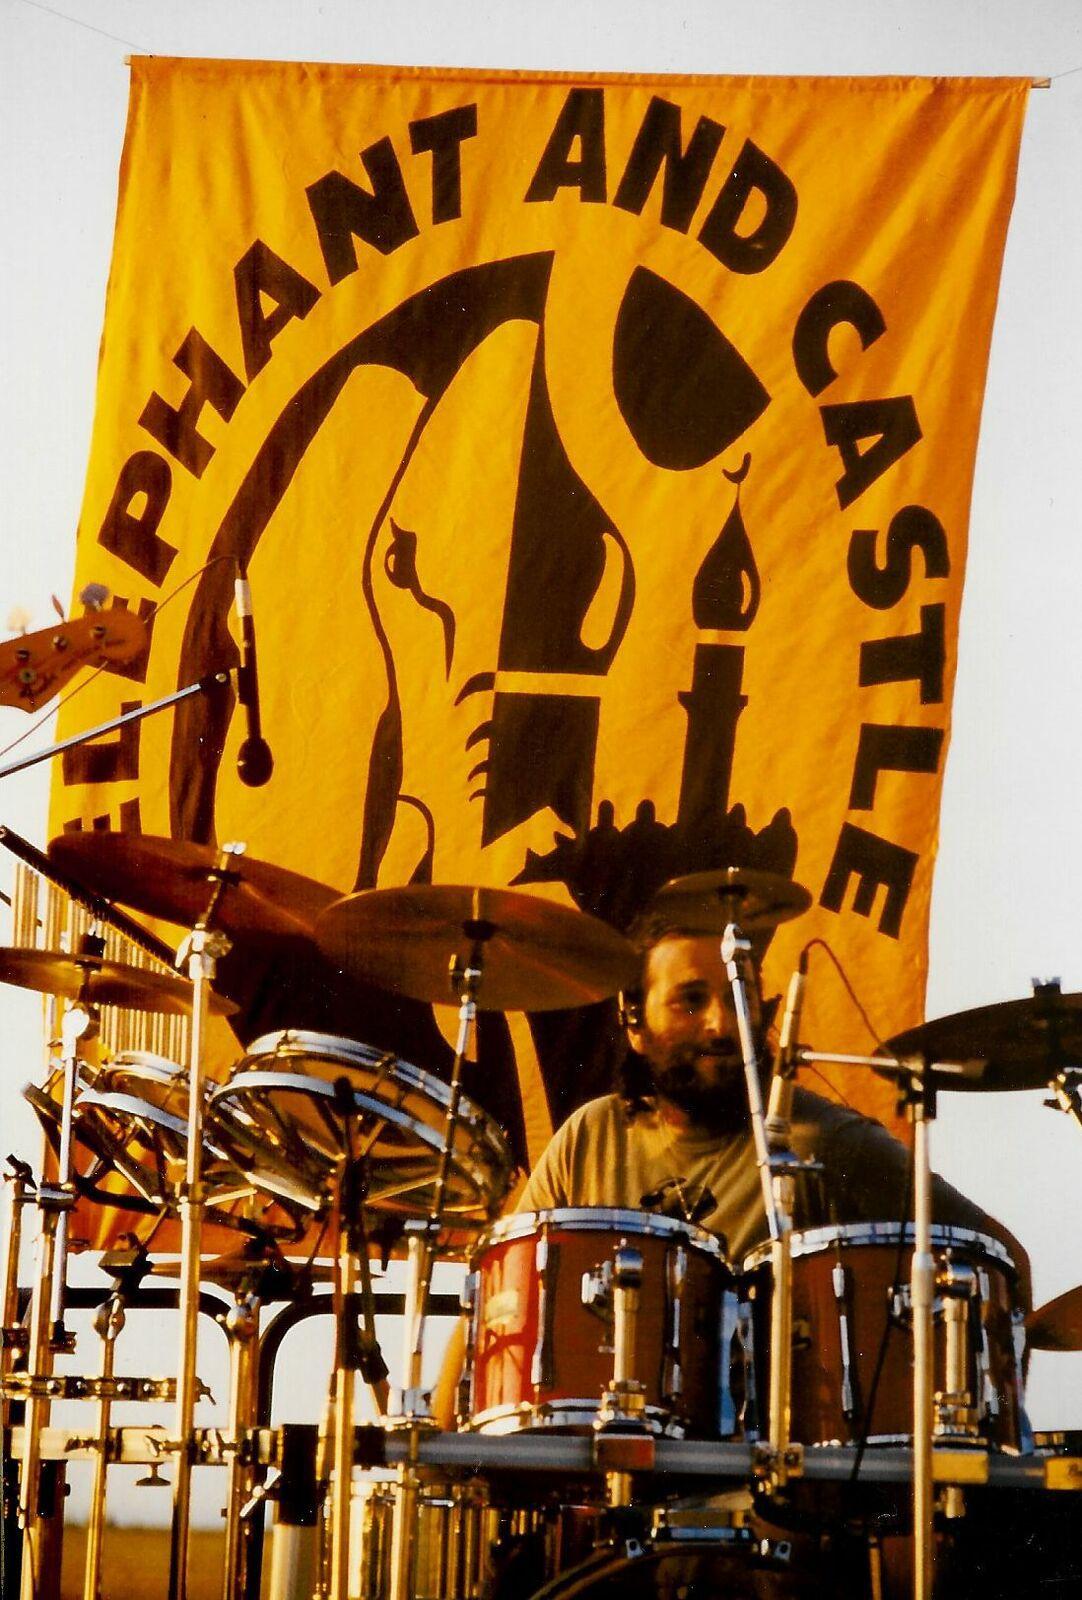 Avedis is THE Elephant & Castle drummer